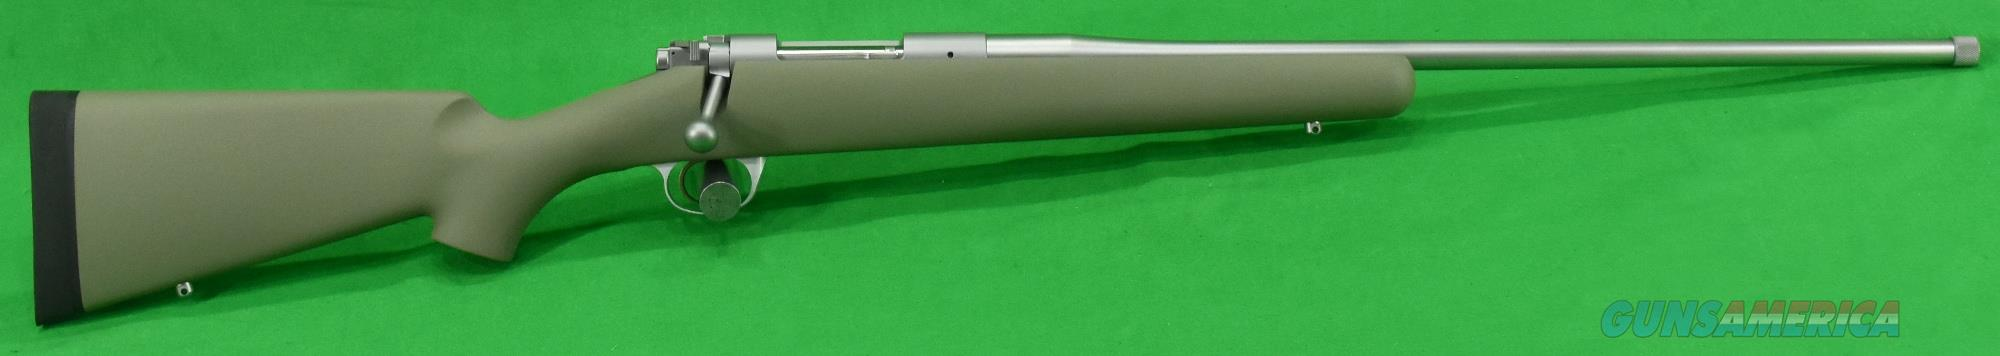 84M Montana Green 308 Win 22In TB  3000802  Guns > Rifles > Kimber of America Rifles